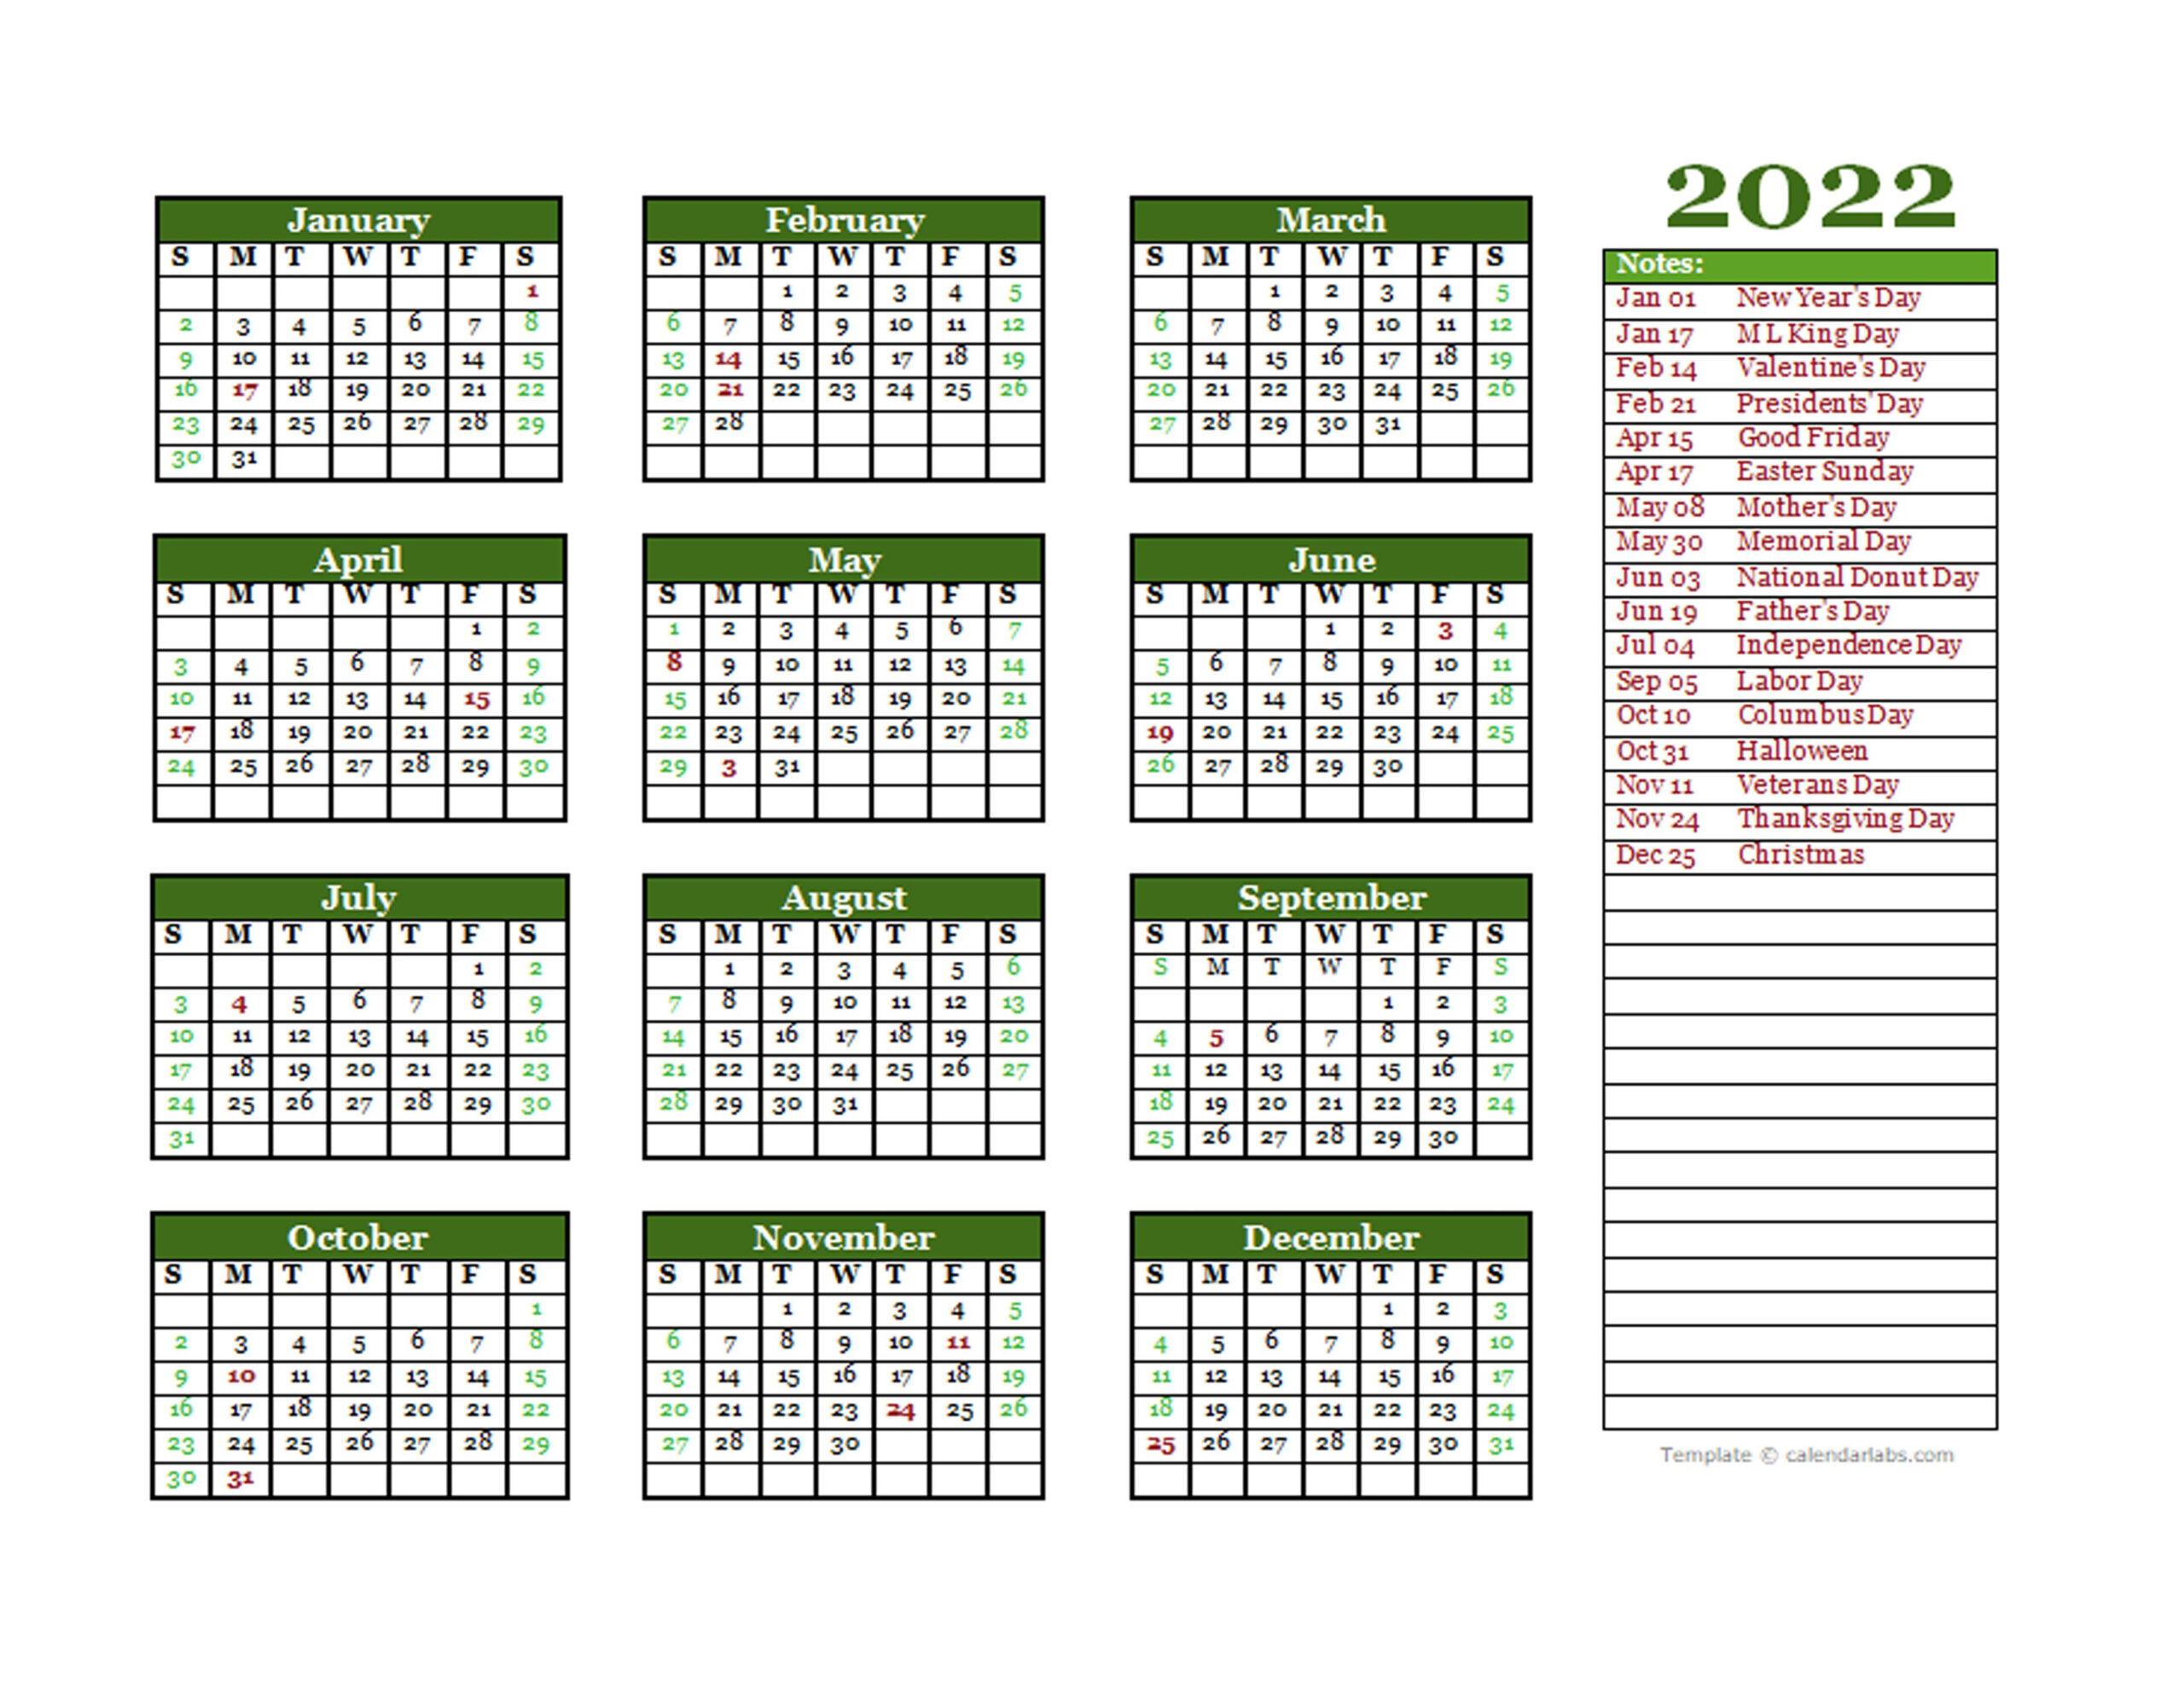 Editable 2022 Yearly Calendar Landscape - Free Printable pertaining to Yearly Planner 2022 Printable Free